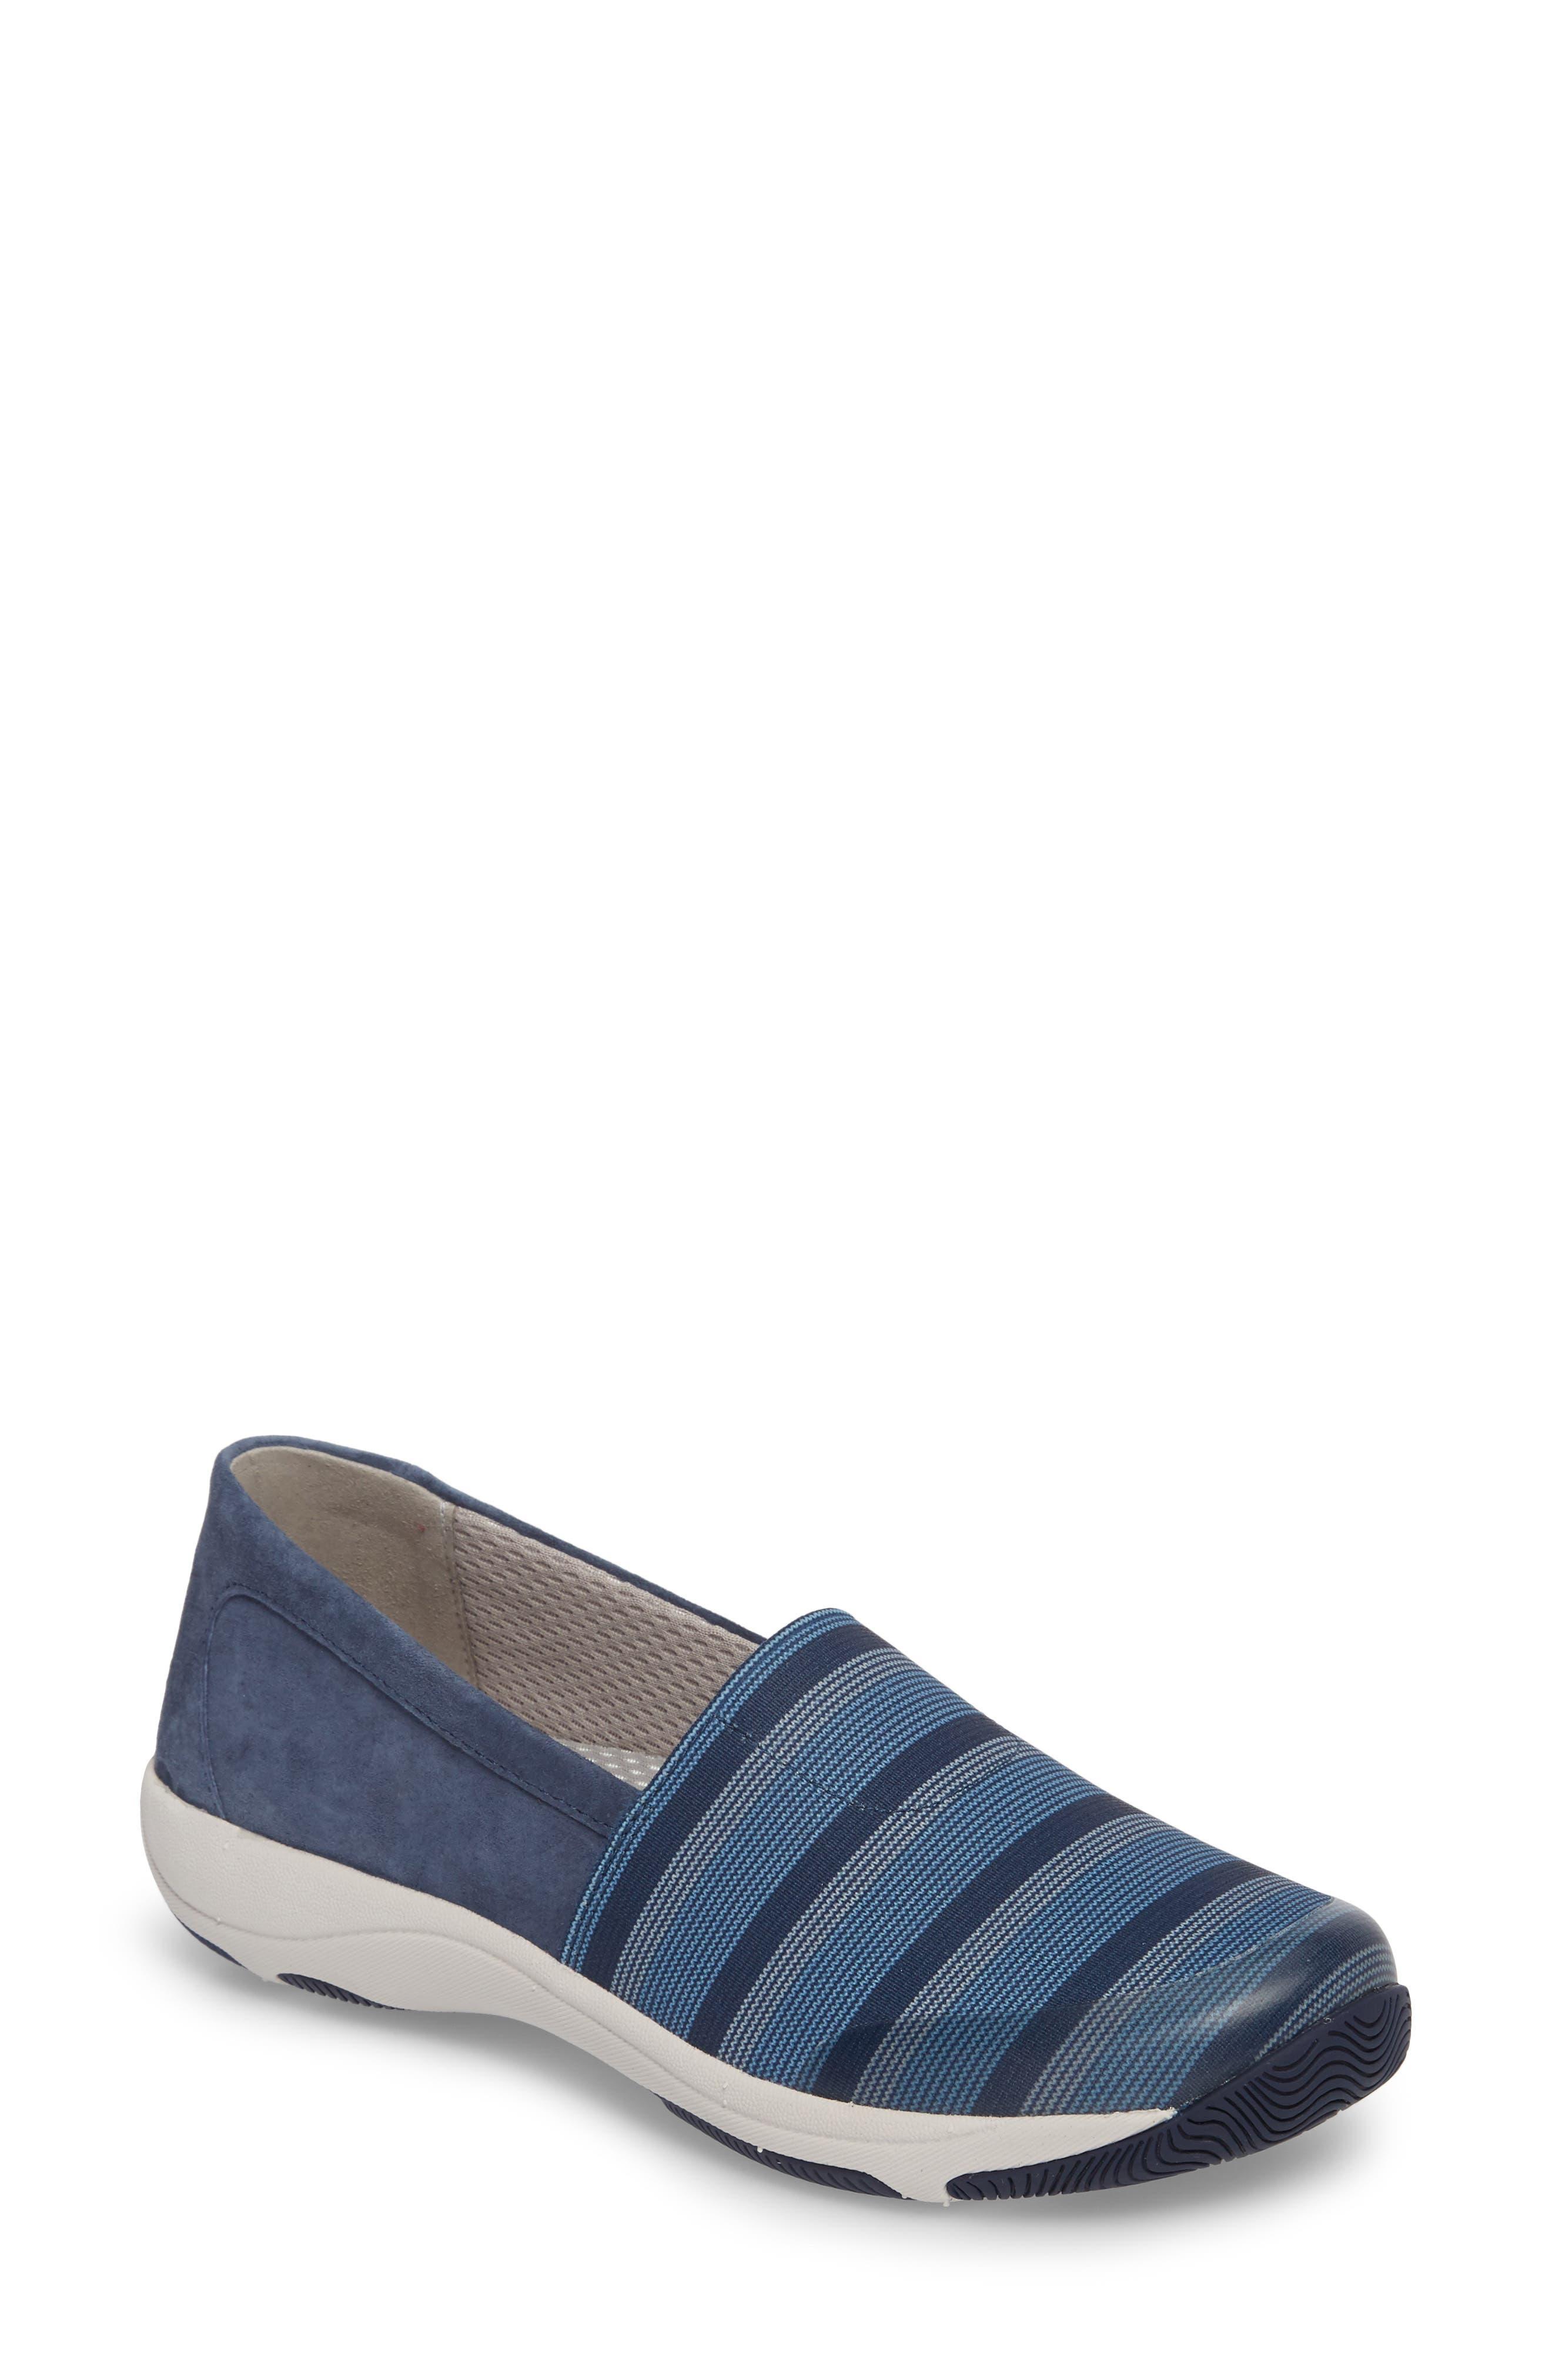 Harriet Slip-On Sneaker,                         Main,                         color, Blue Suede